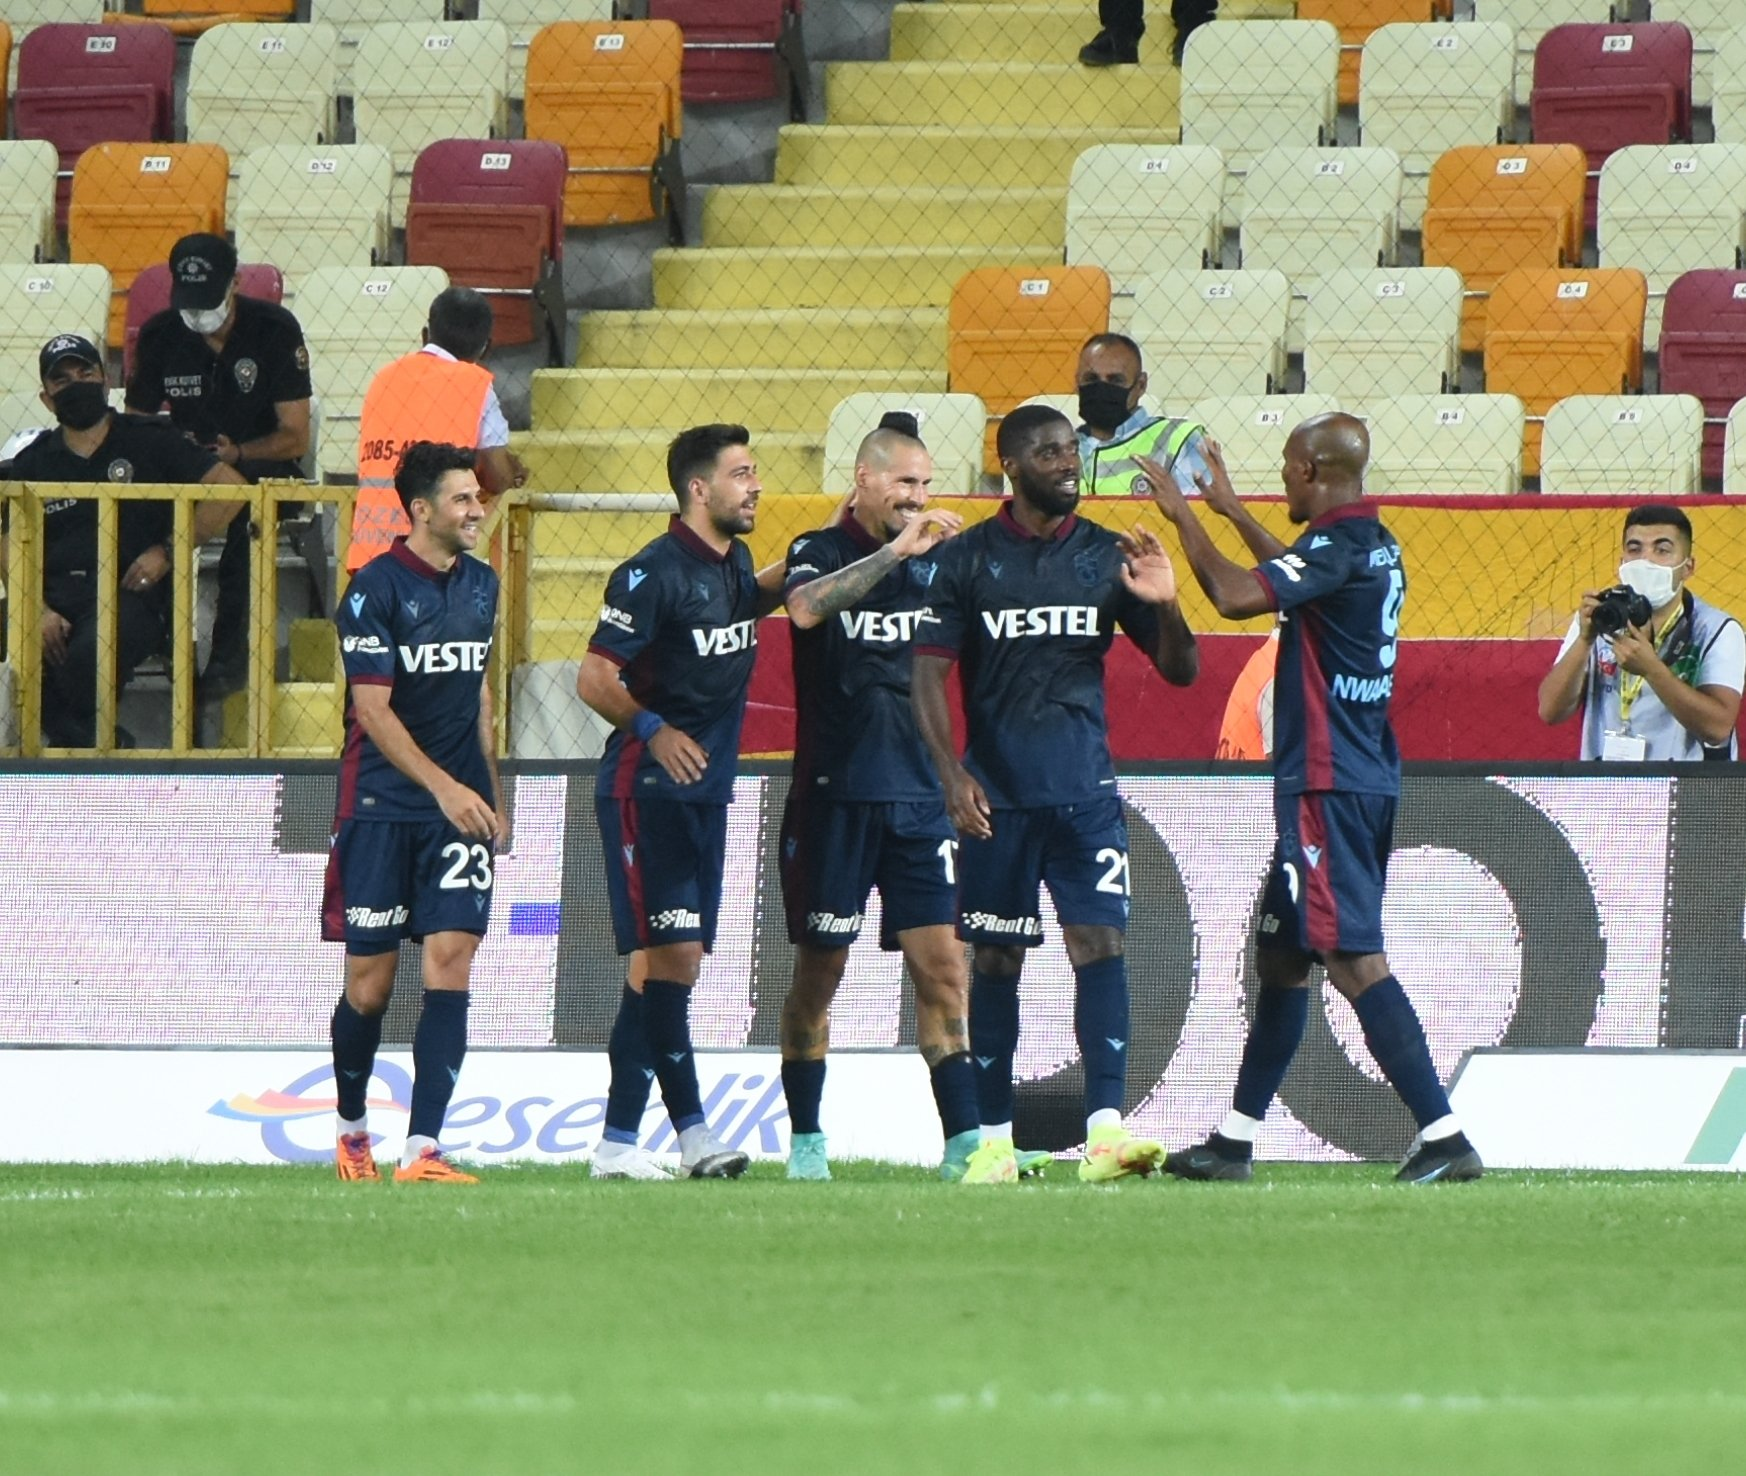 Trabzonspor players celebrate a goal in a Süper Lig match against Malatyaspor at the Yeni Malatya Stadium, Malatya, Turkey, Aug. 16, 2021.